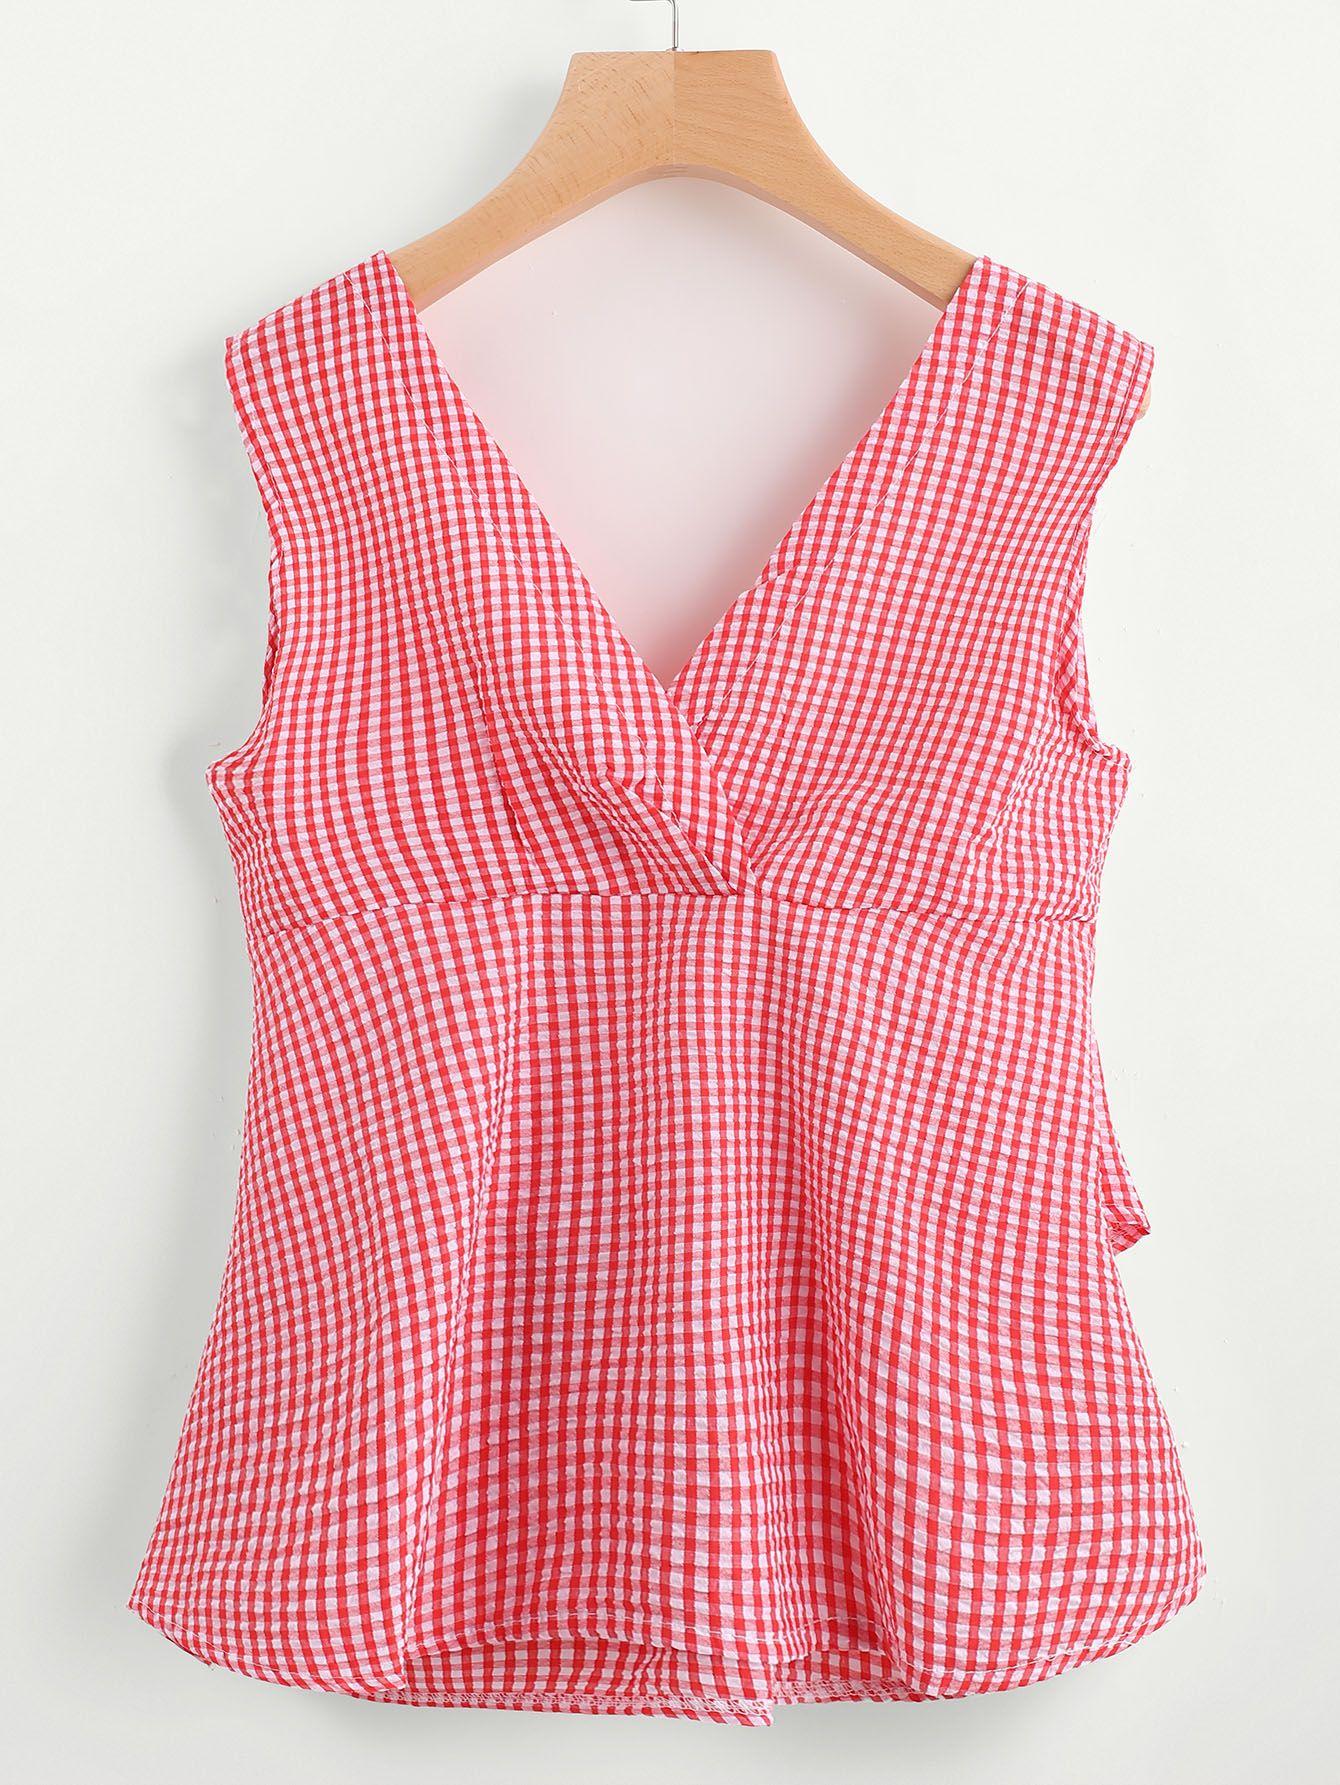 joefsf   costura   Pinterest   Blusas, Costura y Belleza